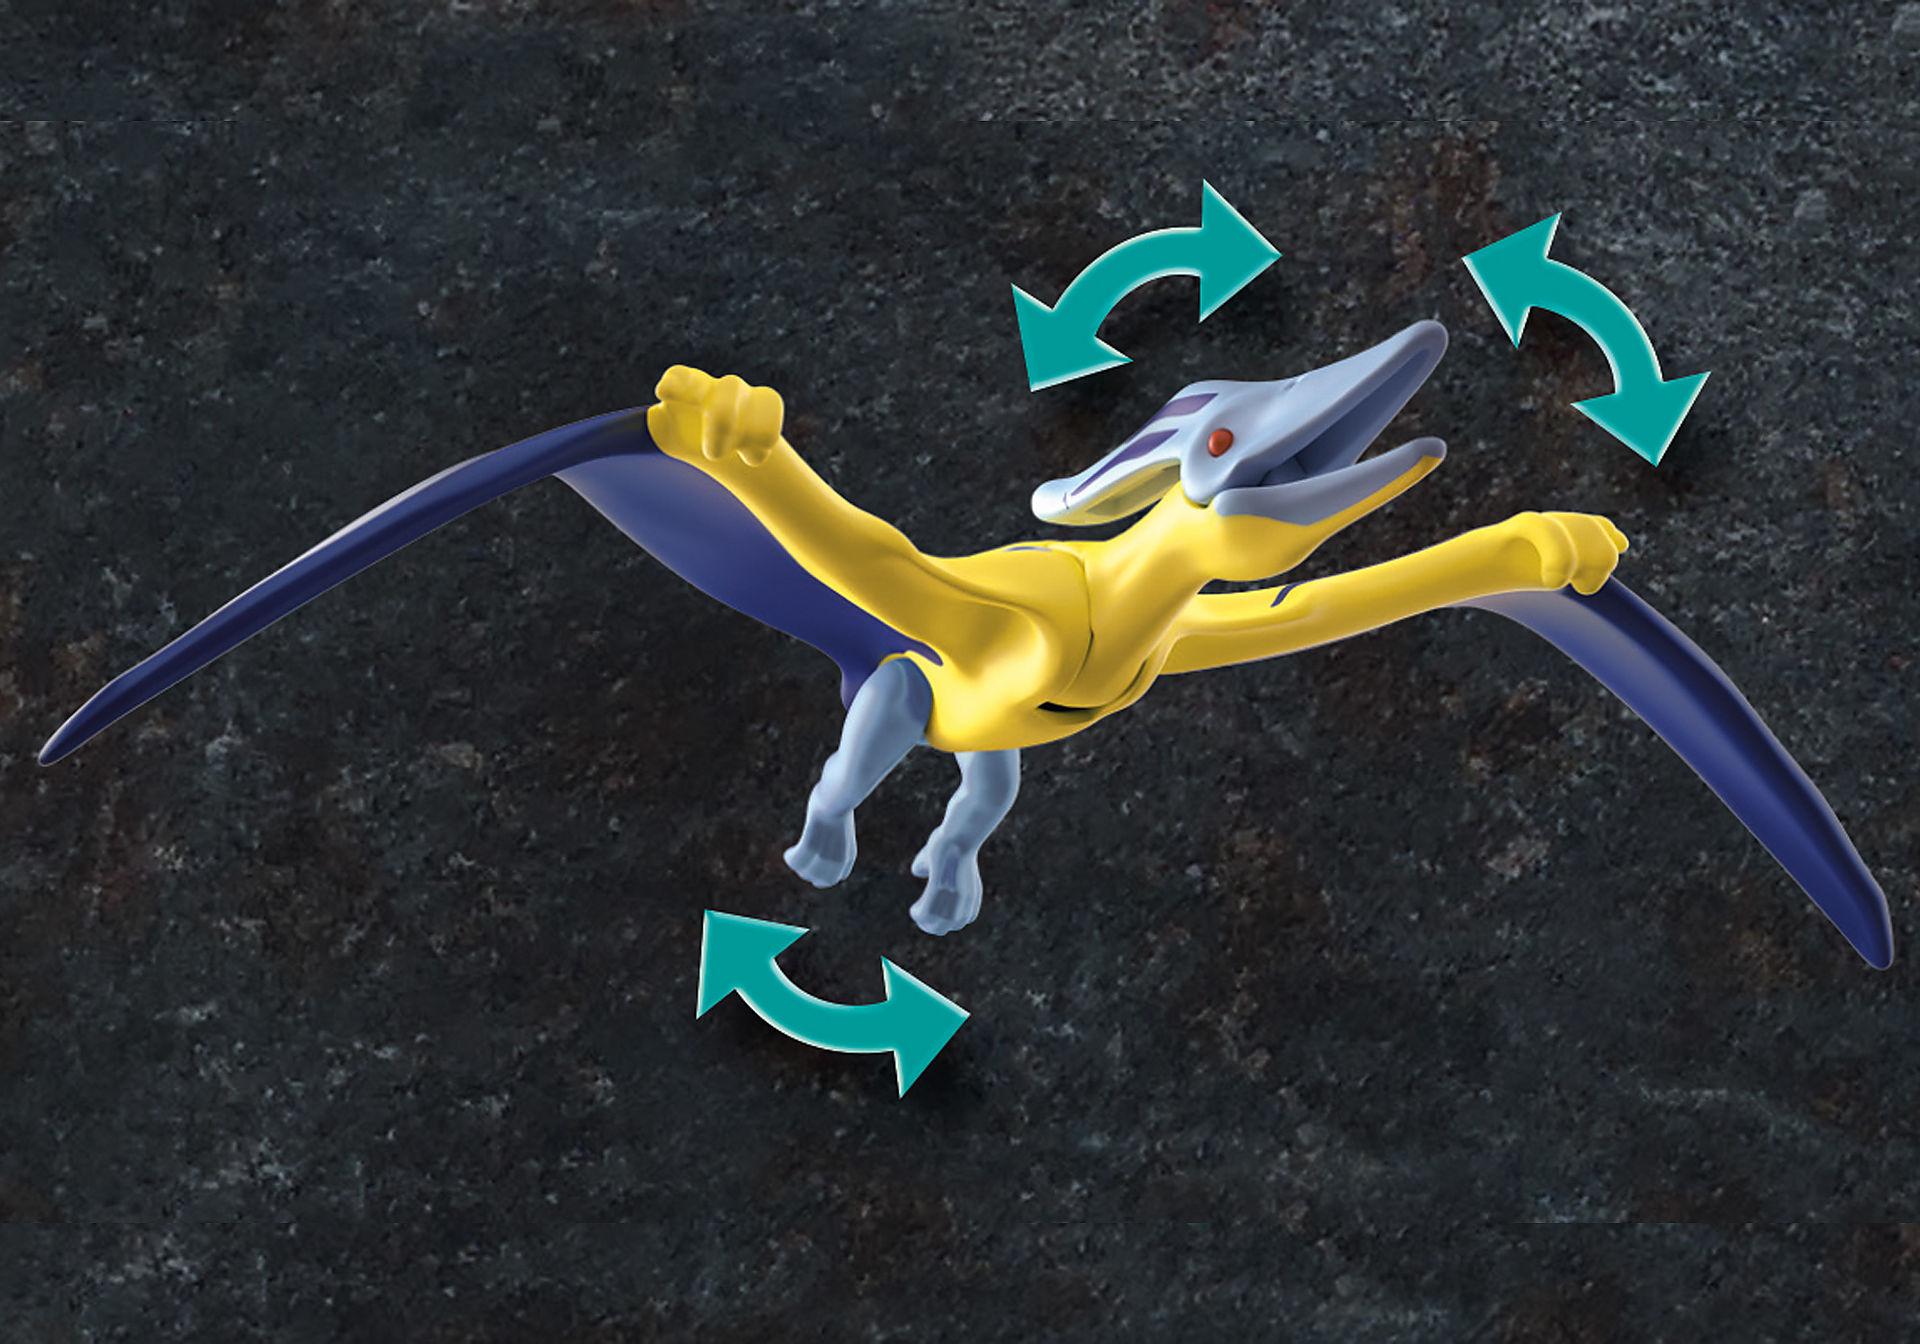 70628 Pteranodon: Drönaren attackerar zoom image4